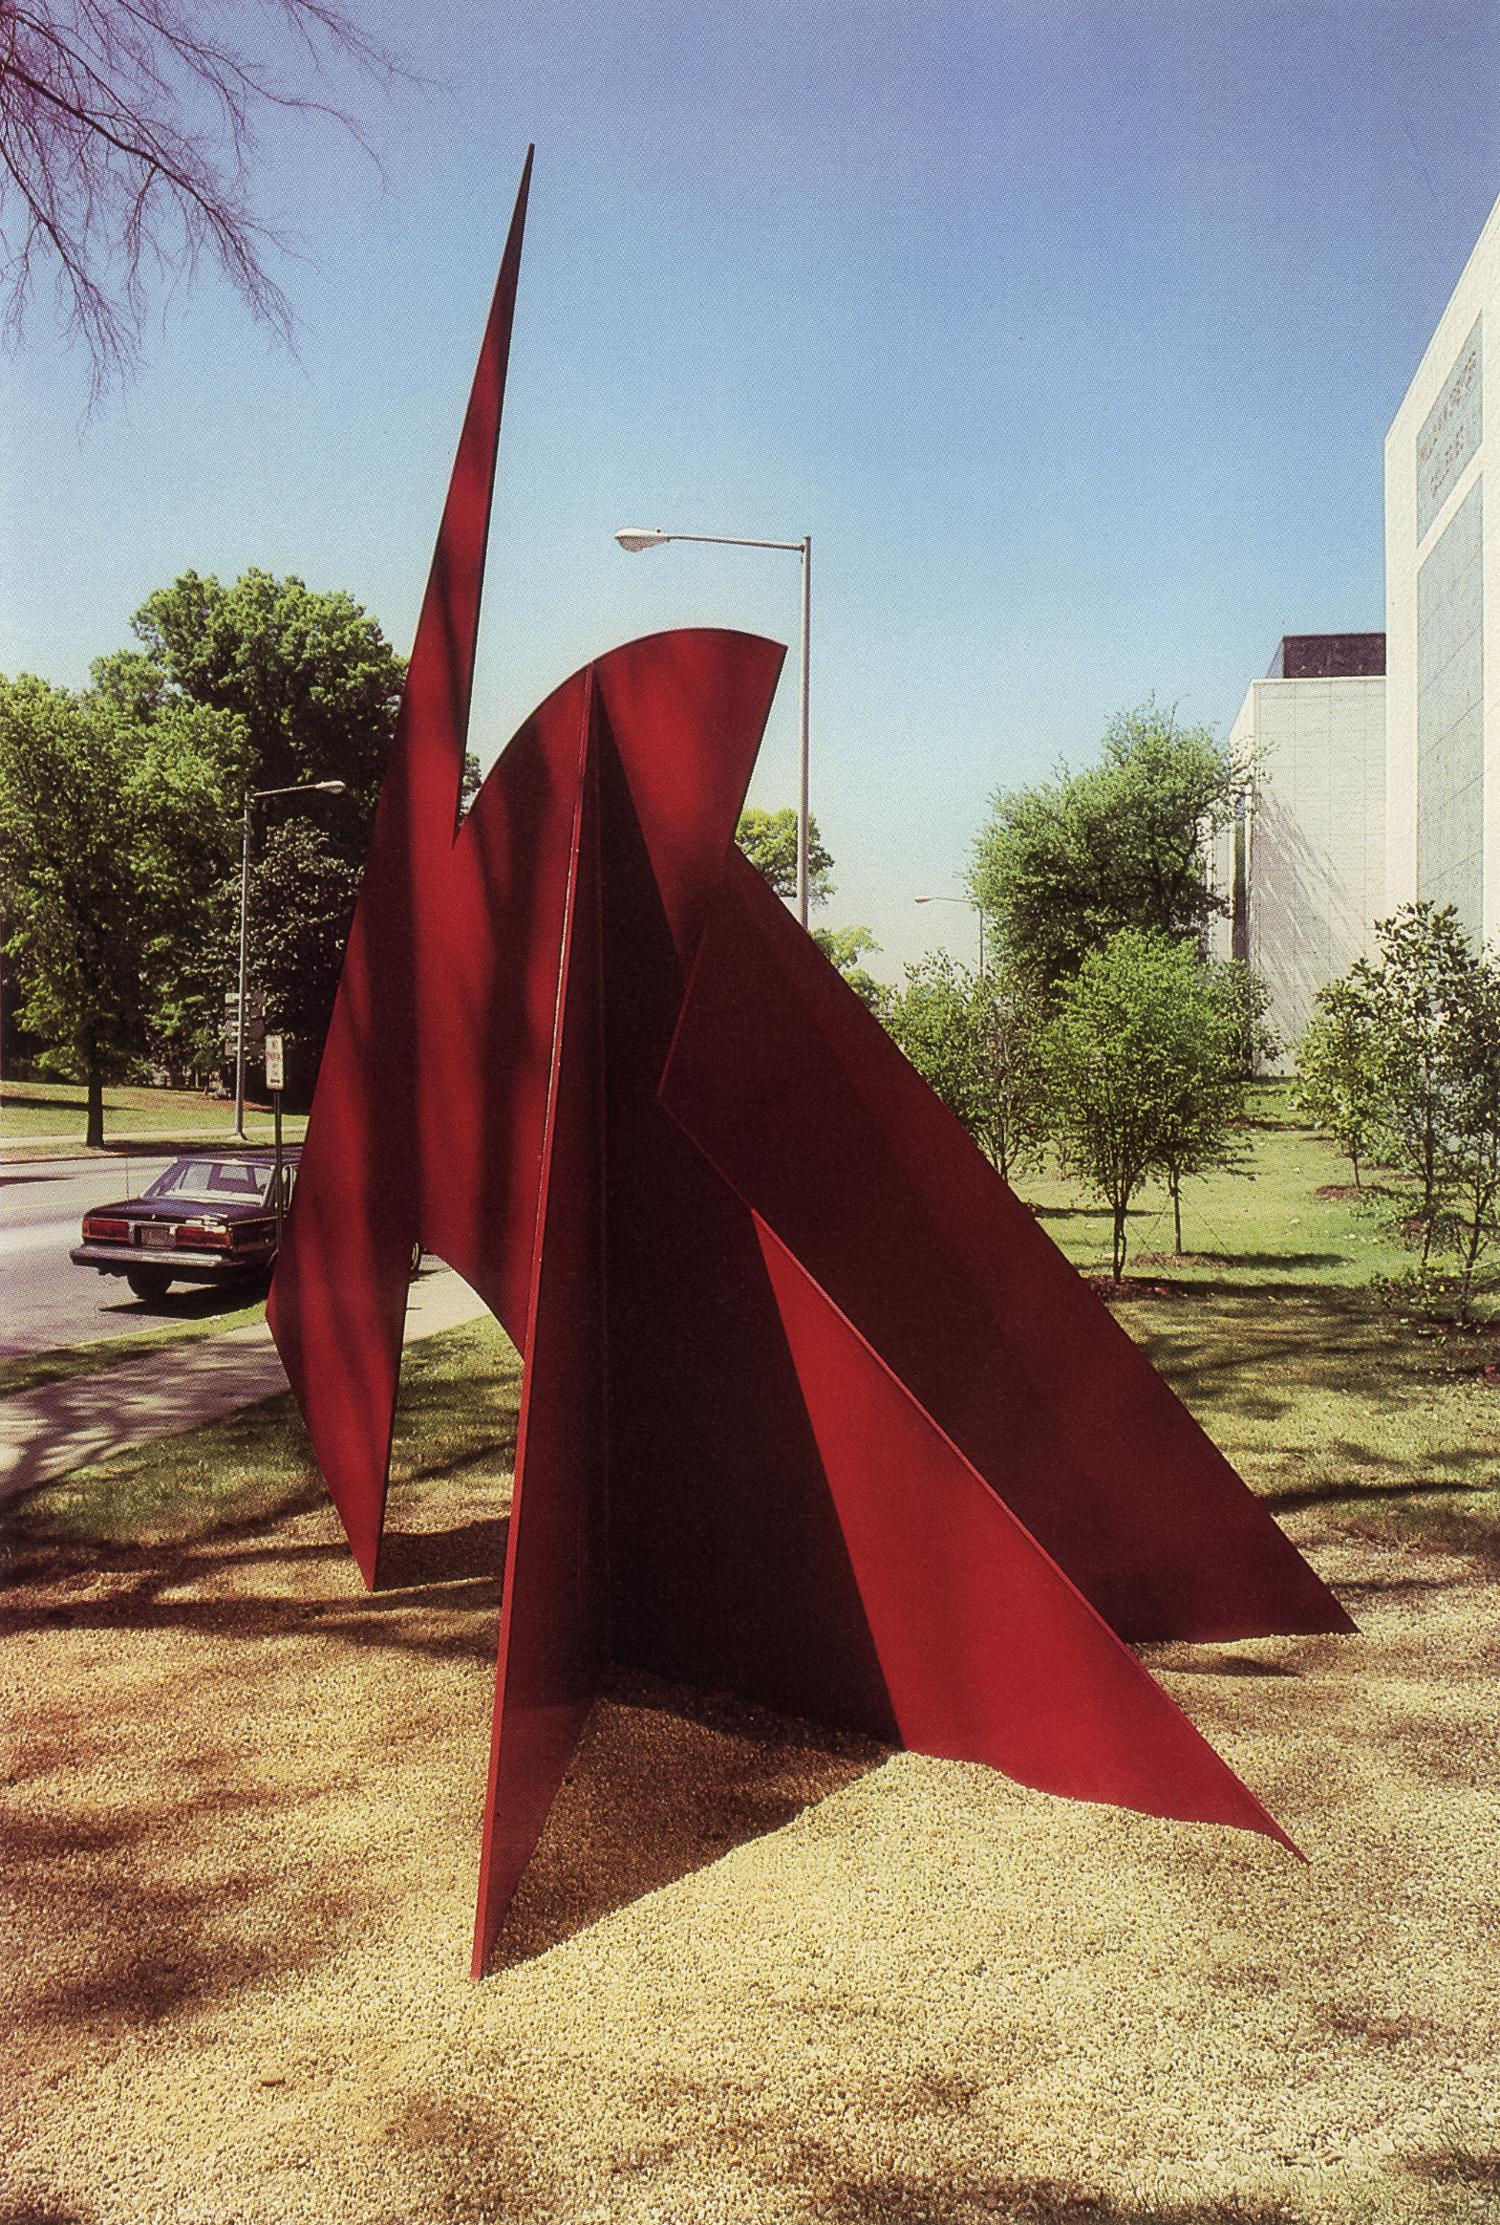 Birmingham Museum of Art, Birmingham, Alabama; 1986.  Kaikoo II.  16' x 13' x 12'.